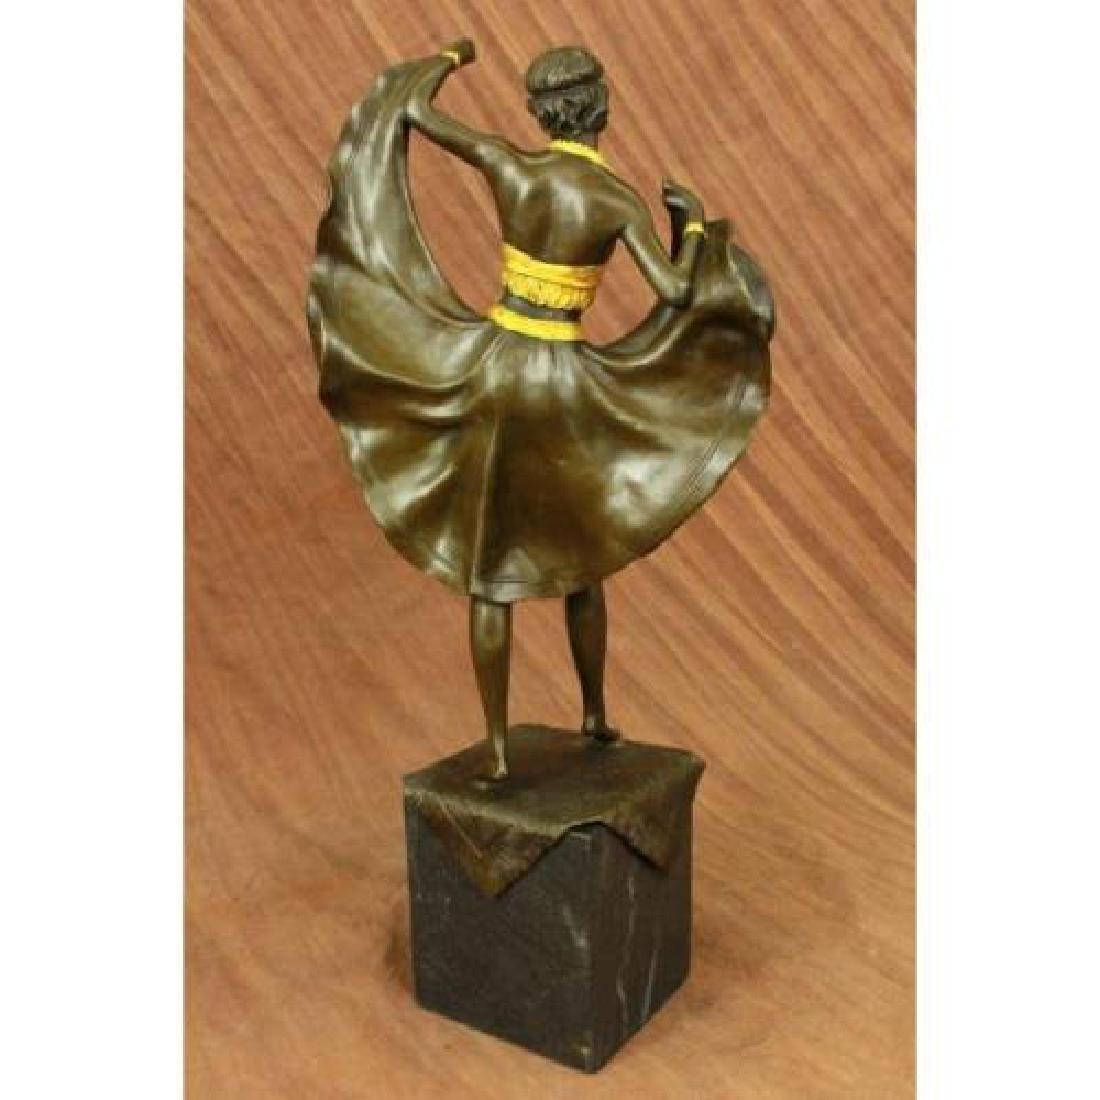 Arabian Girl With Lifting Skirt on Rug Bronze Sculpture - 4